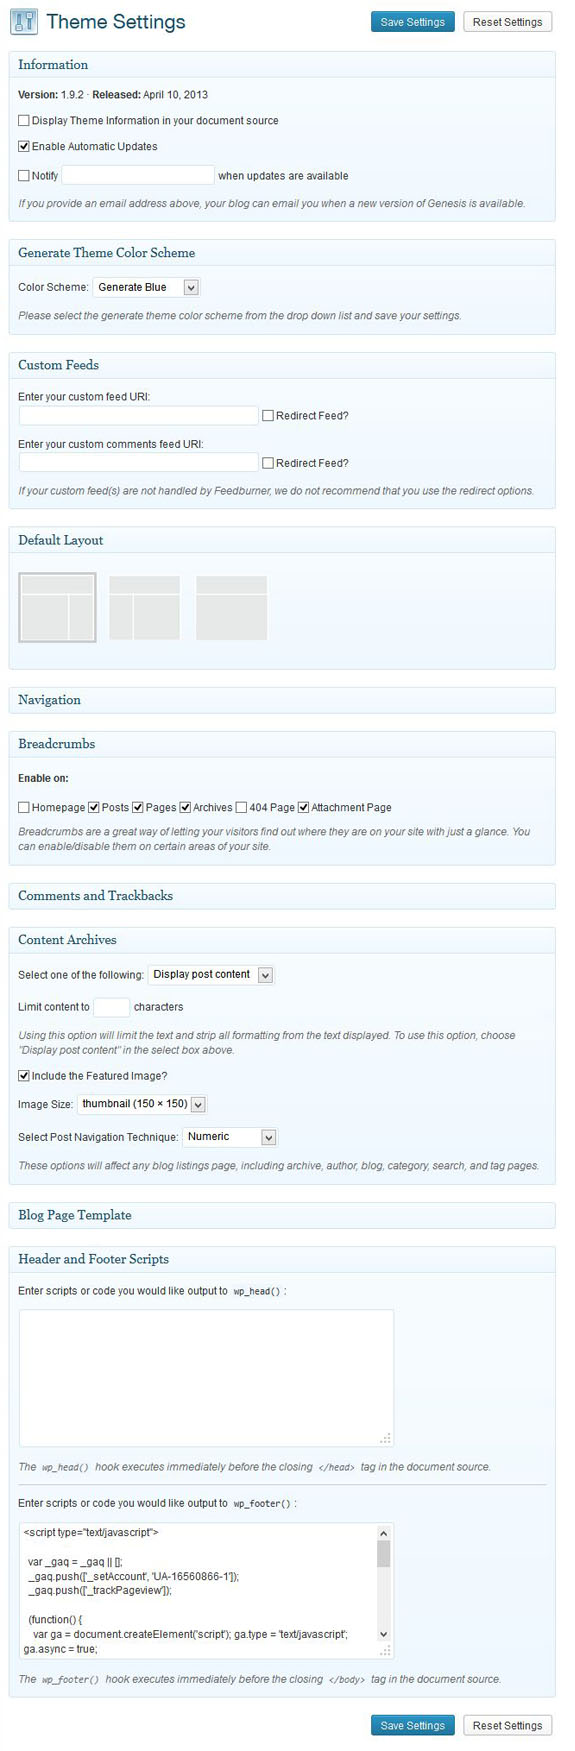 Genesis theme settings page